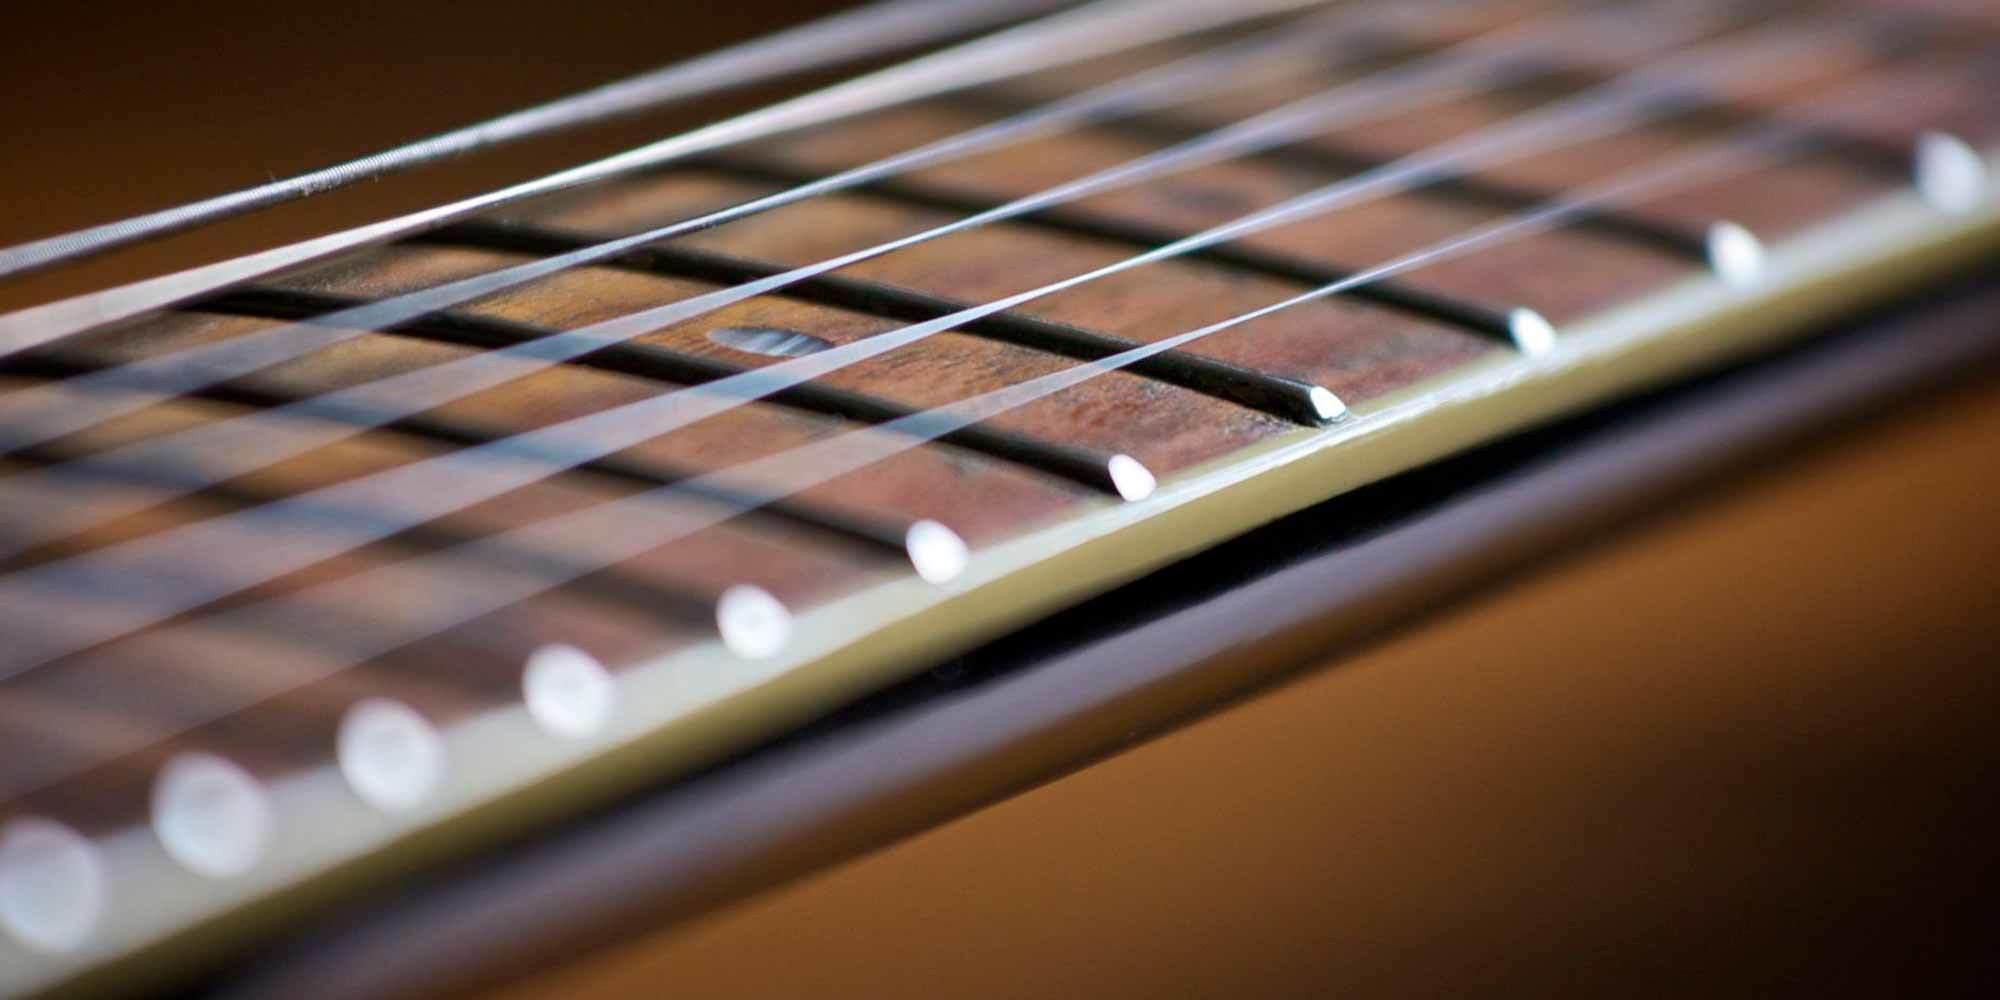 guitar strings materials construction and benefits reverb. Black Bedroom Furniture Sets. Home Design Ideas